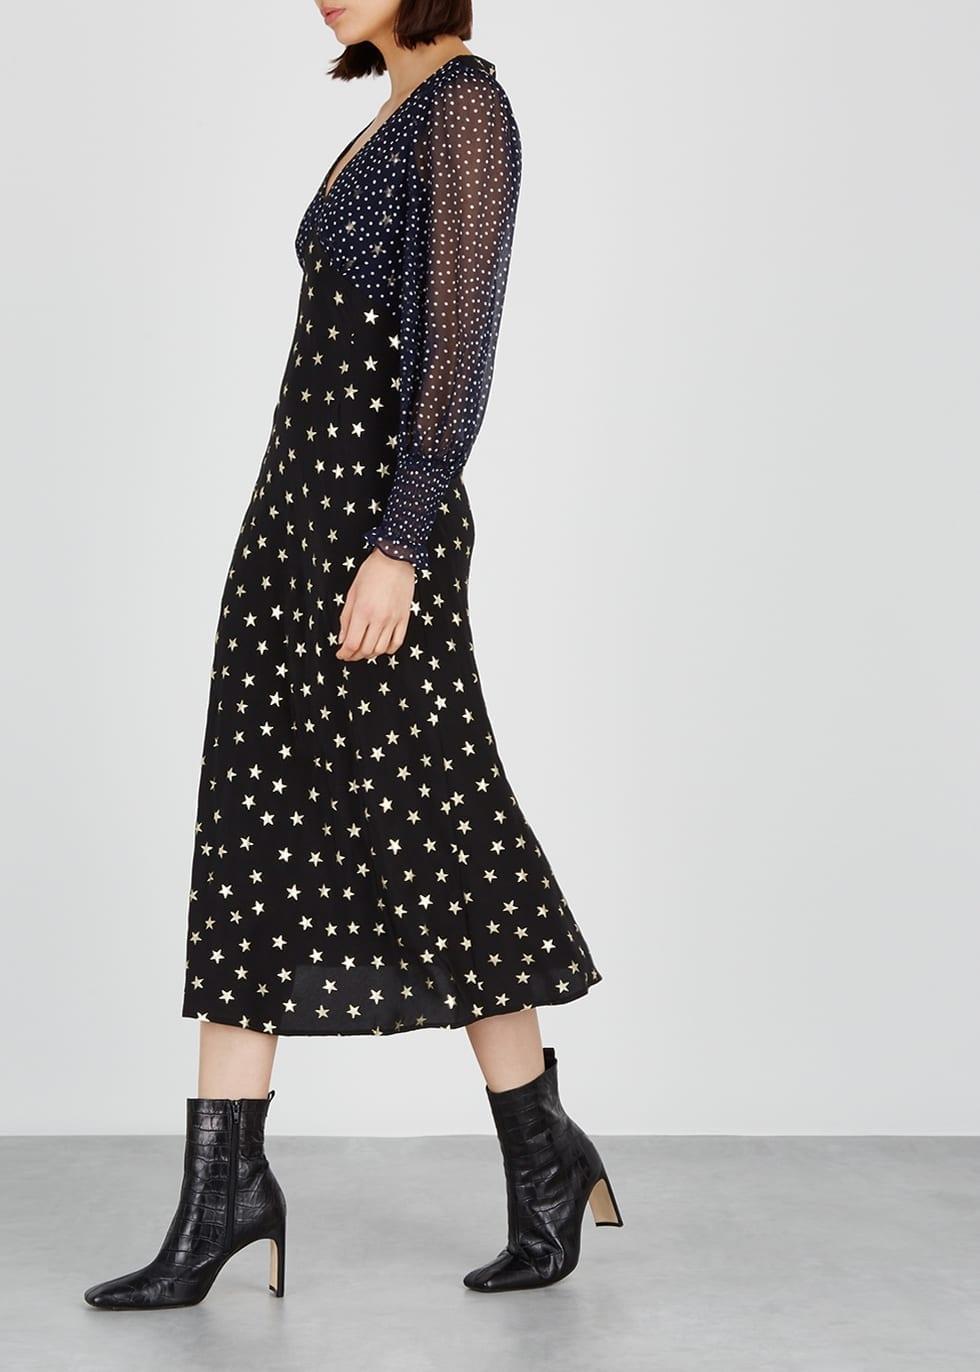 0db9d4faba3 RIXO LONDON Erin Star-Print Silk Midi Black Dress - We Select Dresses